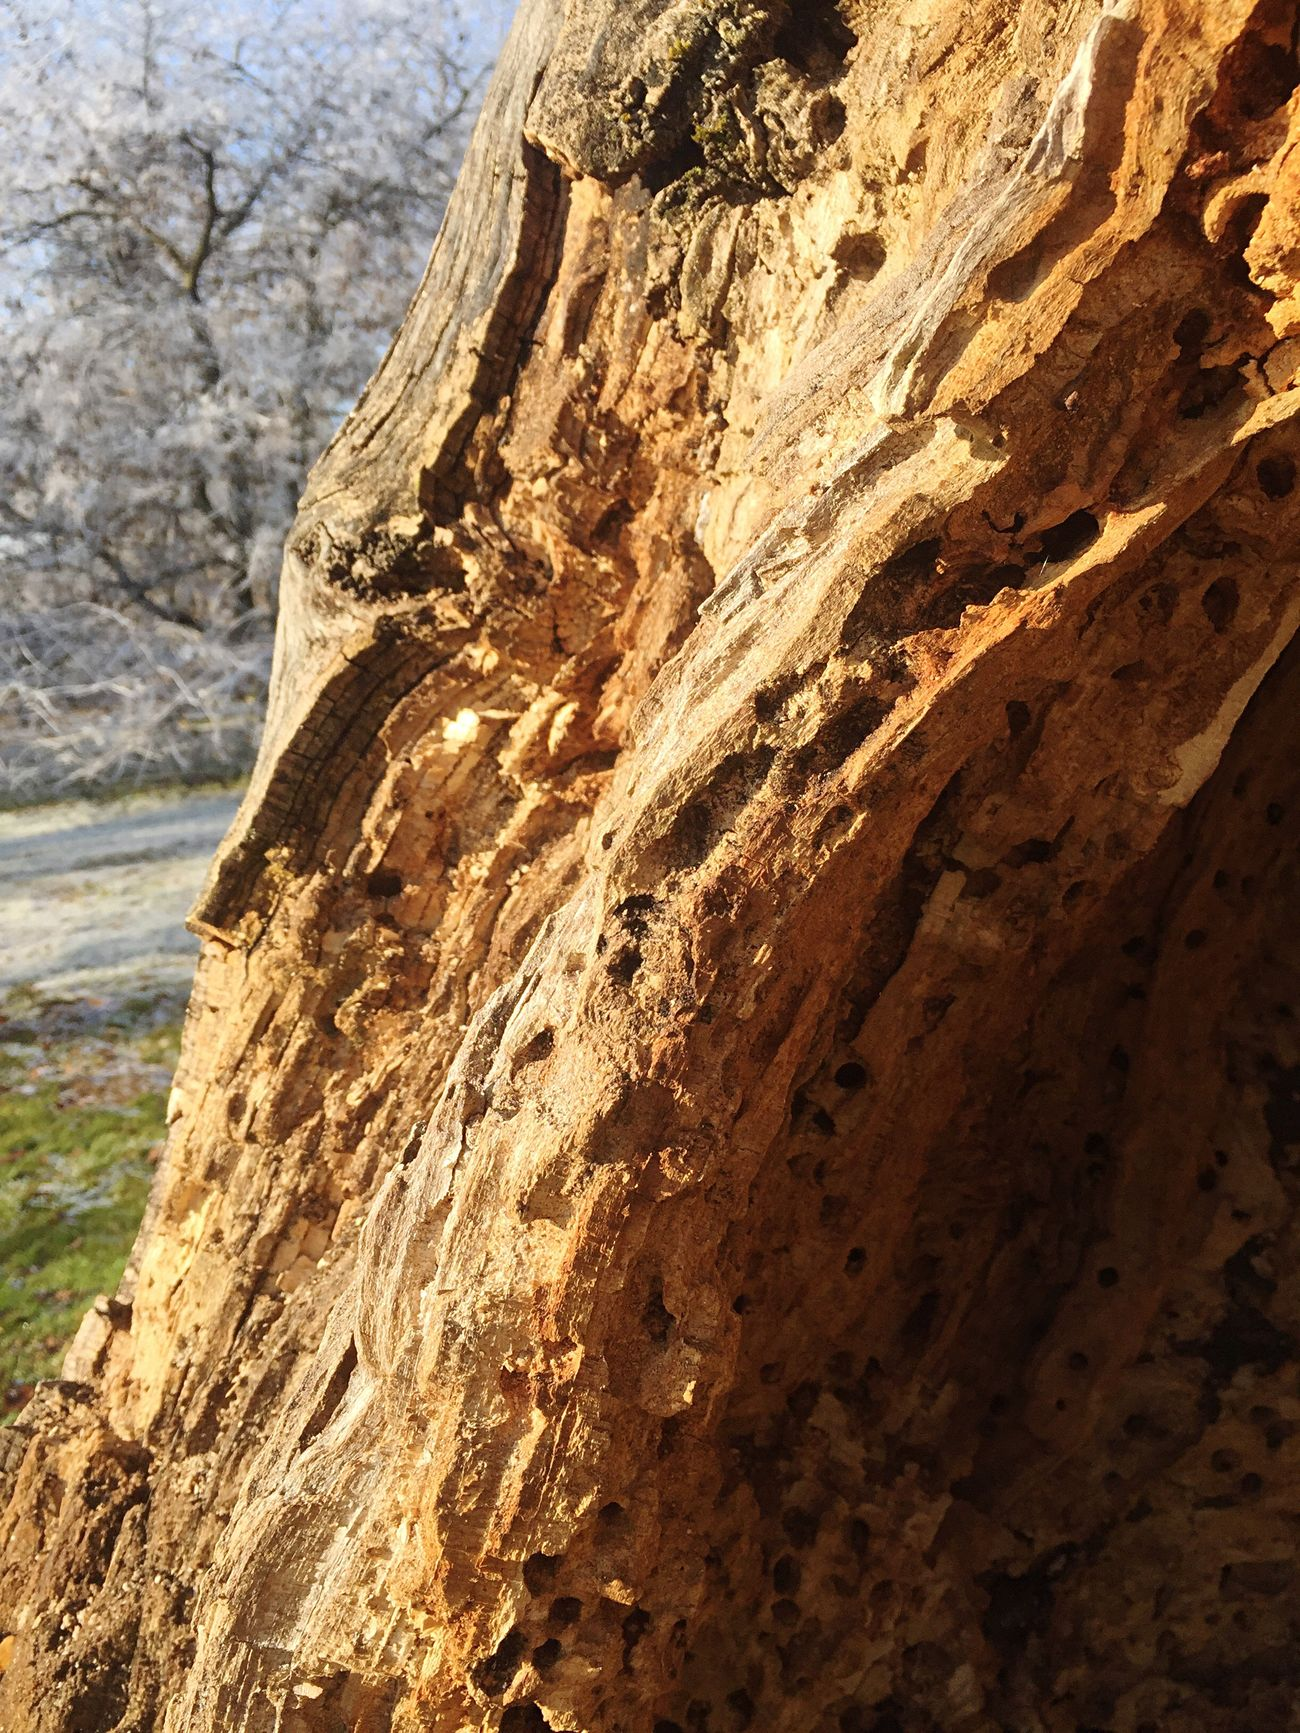 Dead Tree Tree Stump Nature Rough Showcase: December Walking Around Beauty In Nature ☀️❄️🌰